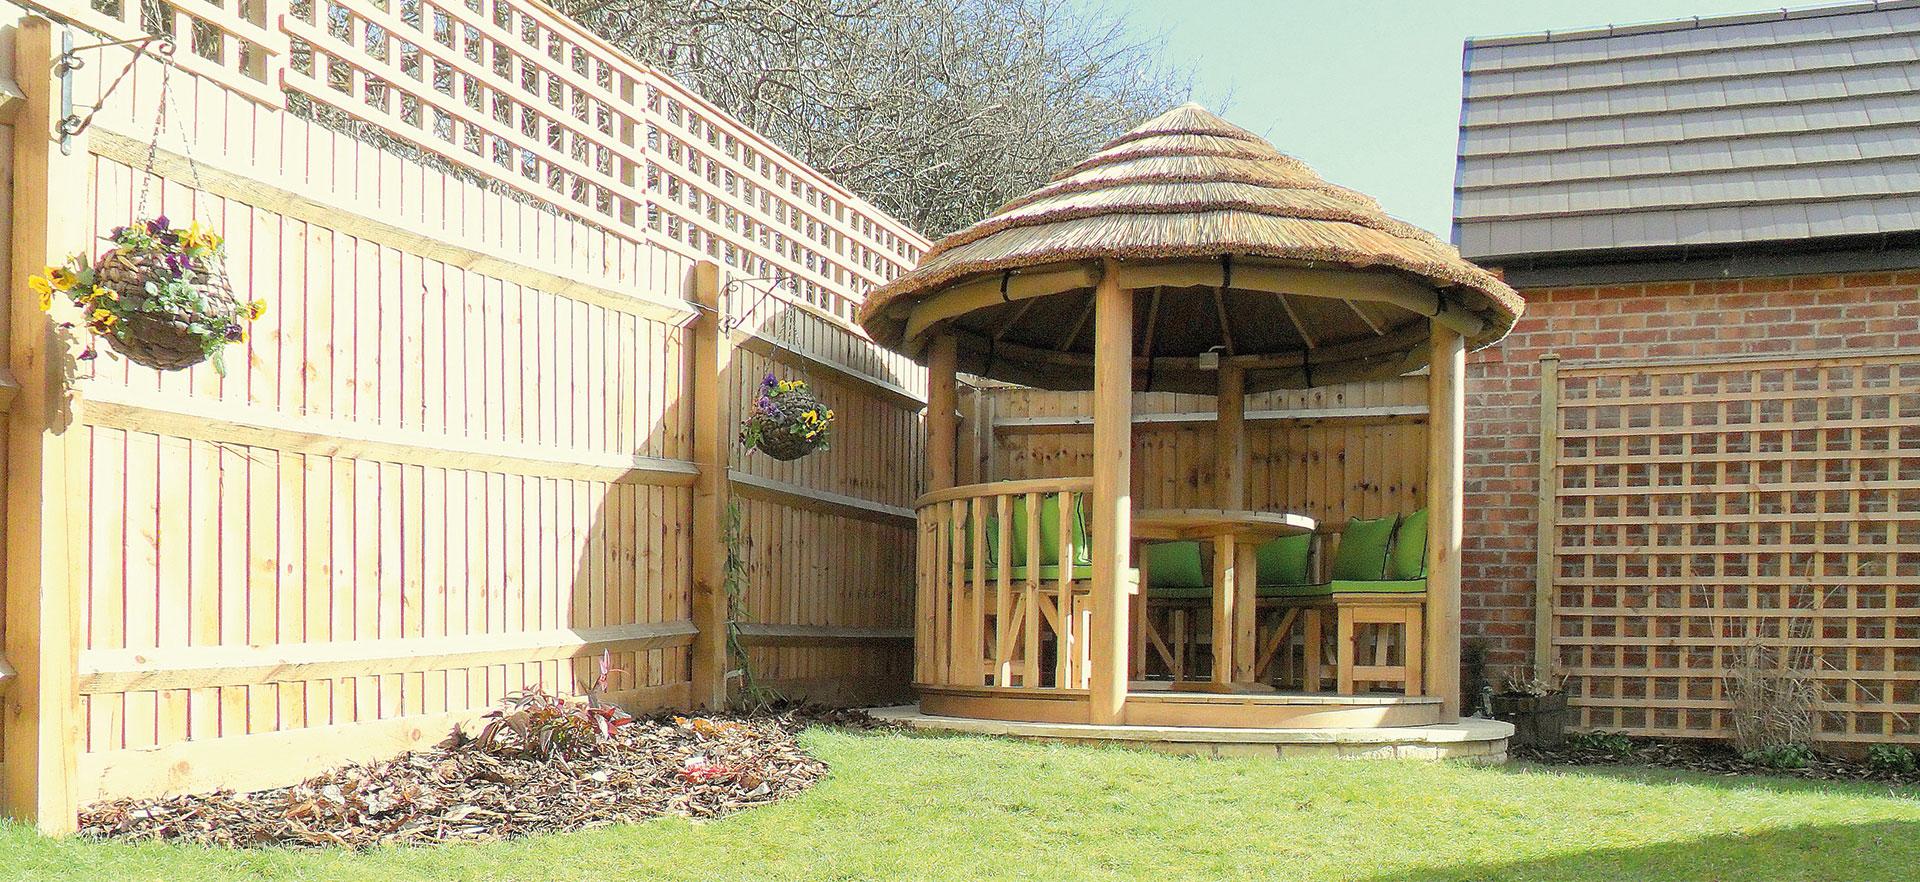 2.5 metre thatched garden gazebo in corner of garden next to fencing